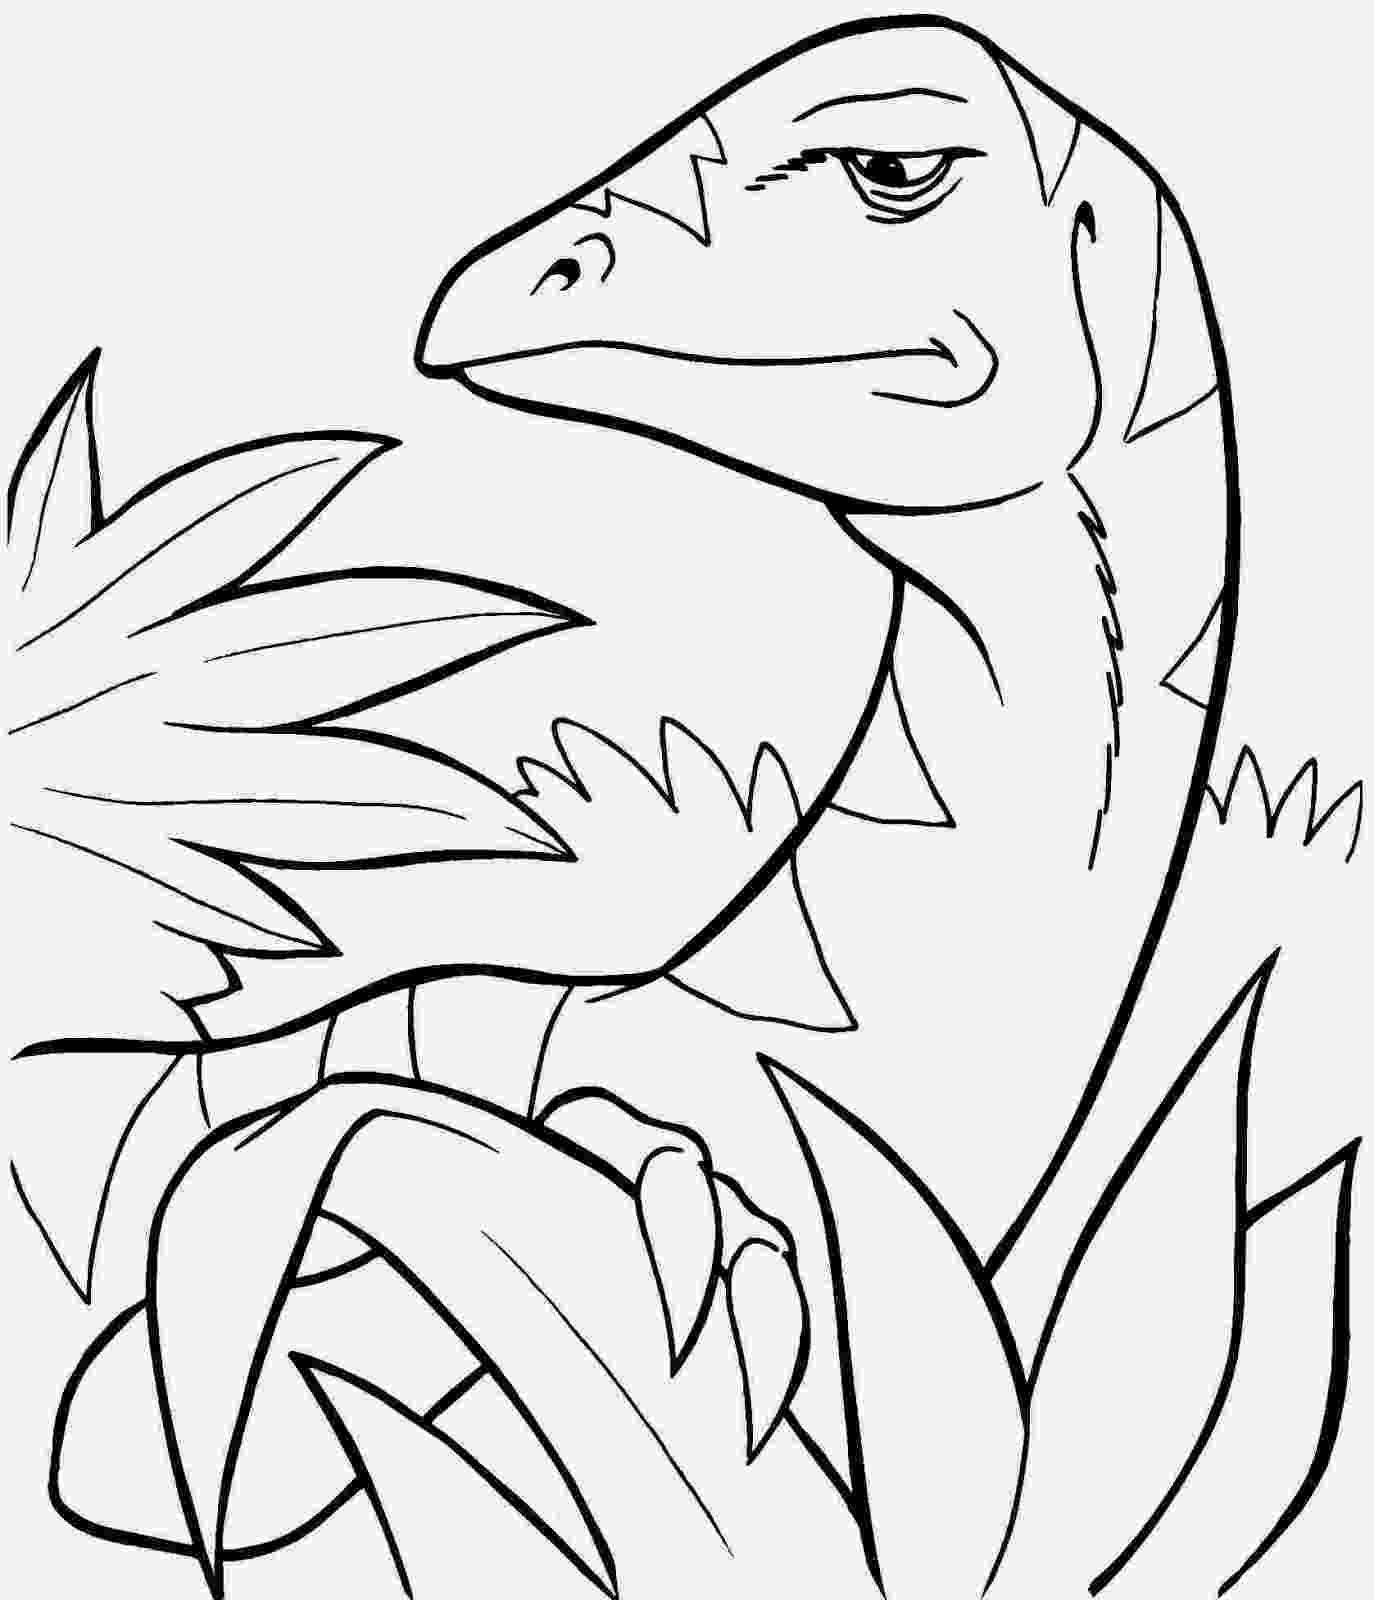 dinosaur printables coloring pages dinosaur free printable coloring pages printables dinosaur 1 1